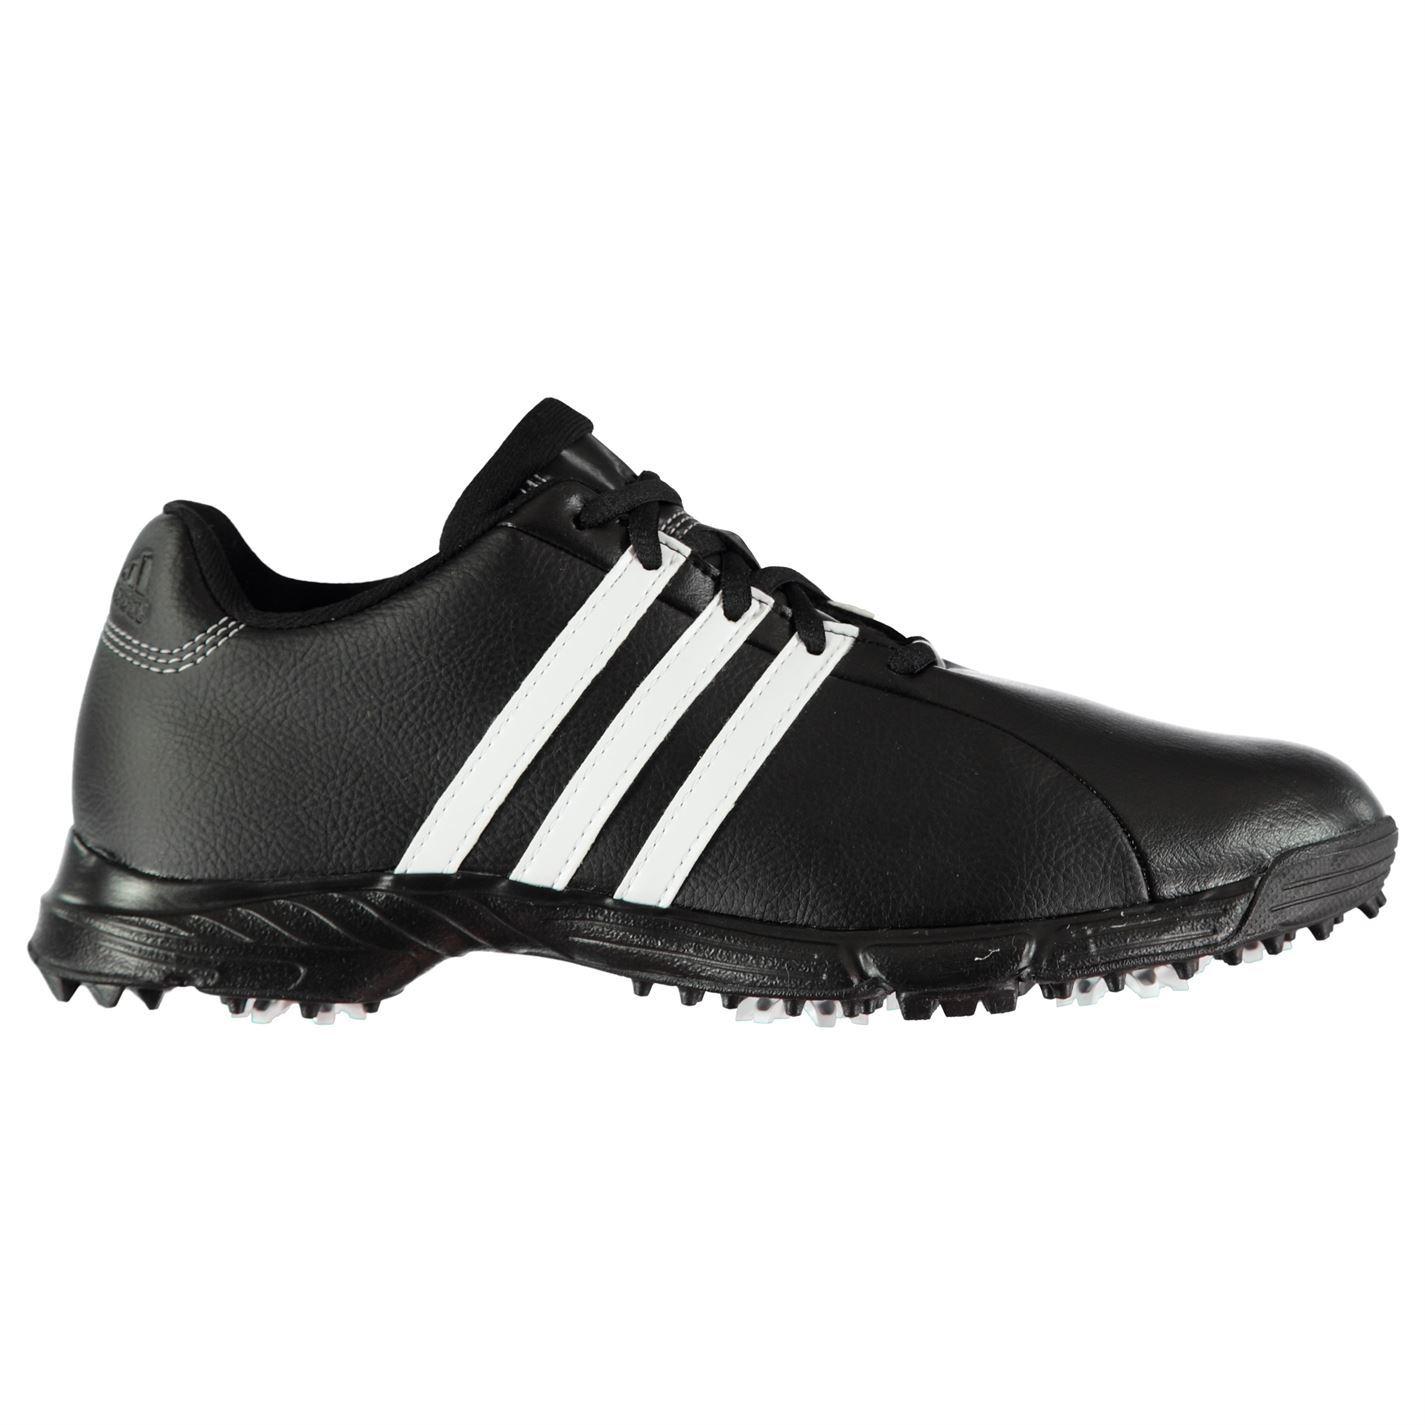 adidas-Golflite-Golf-Shoes-Mens-Spikes-Footwear thumbnail 5